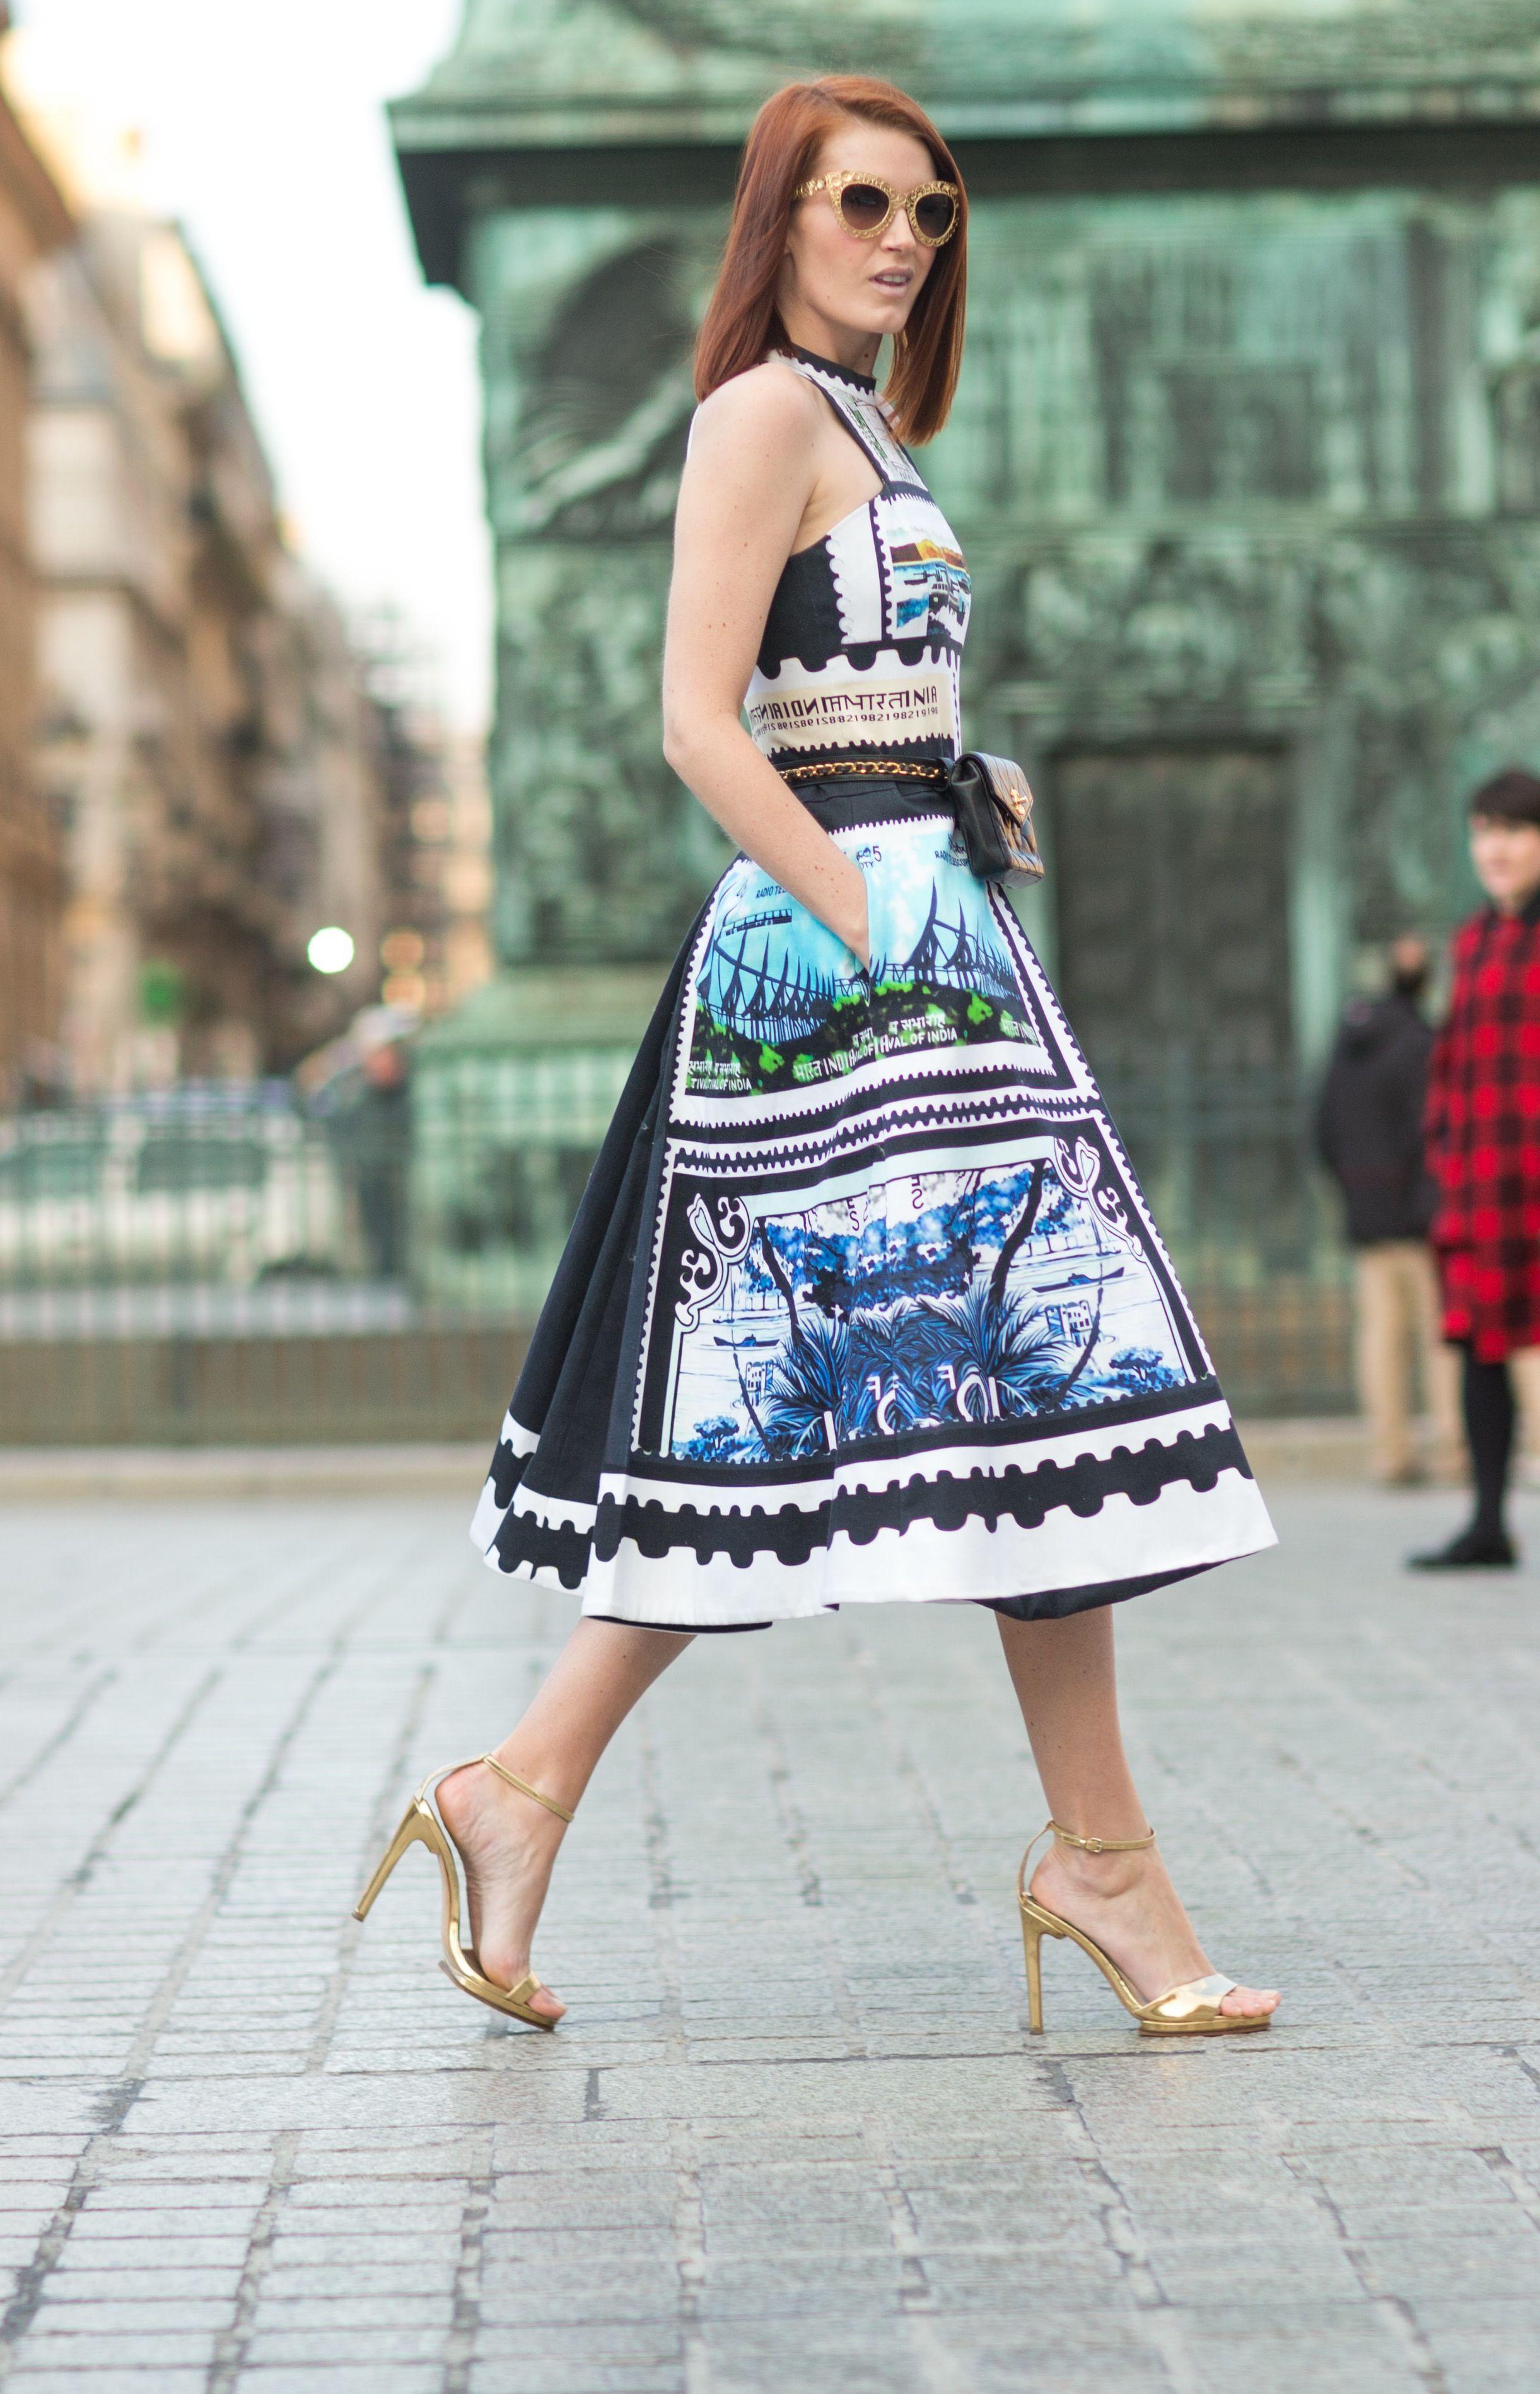 #Street #Fashion #Snap from Paris fashion week.